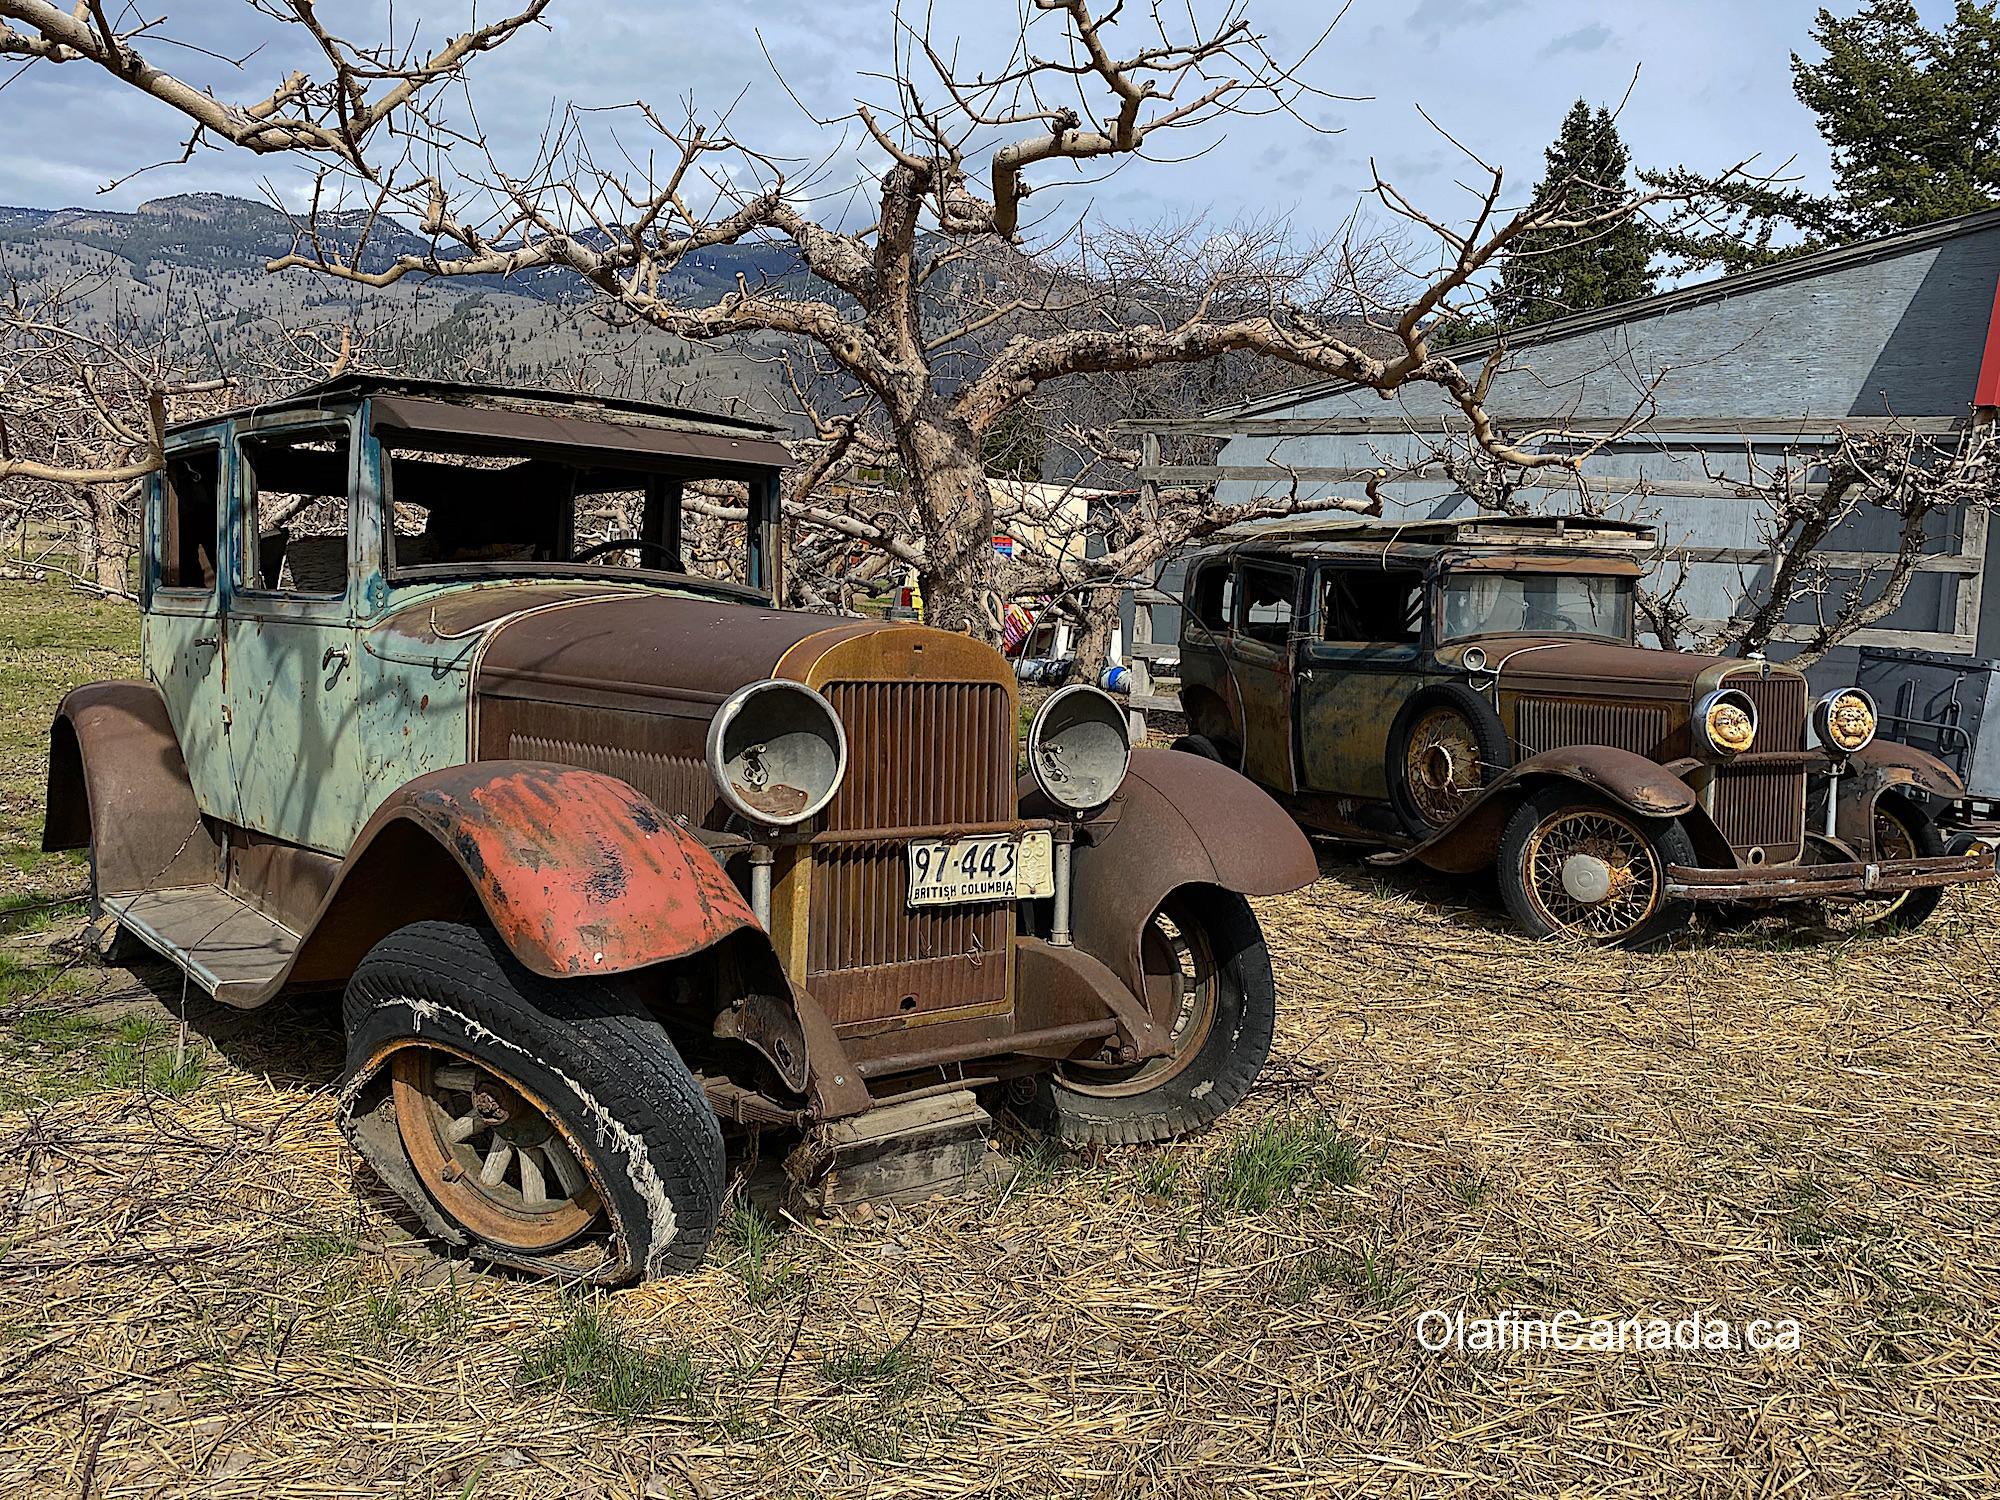 Old cars from the thirties in Keremeos #olafincanada #britishcolumbia #discoverbc #abandonedbc #keremeos #car